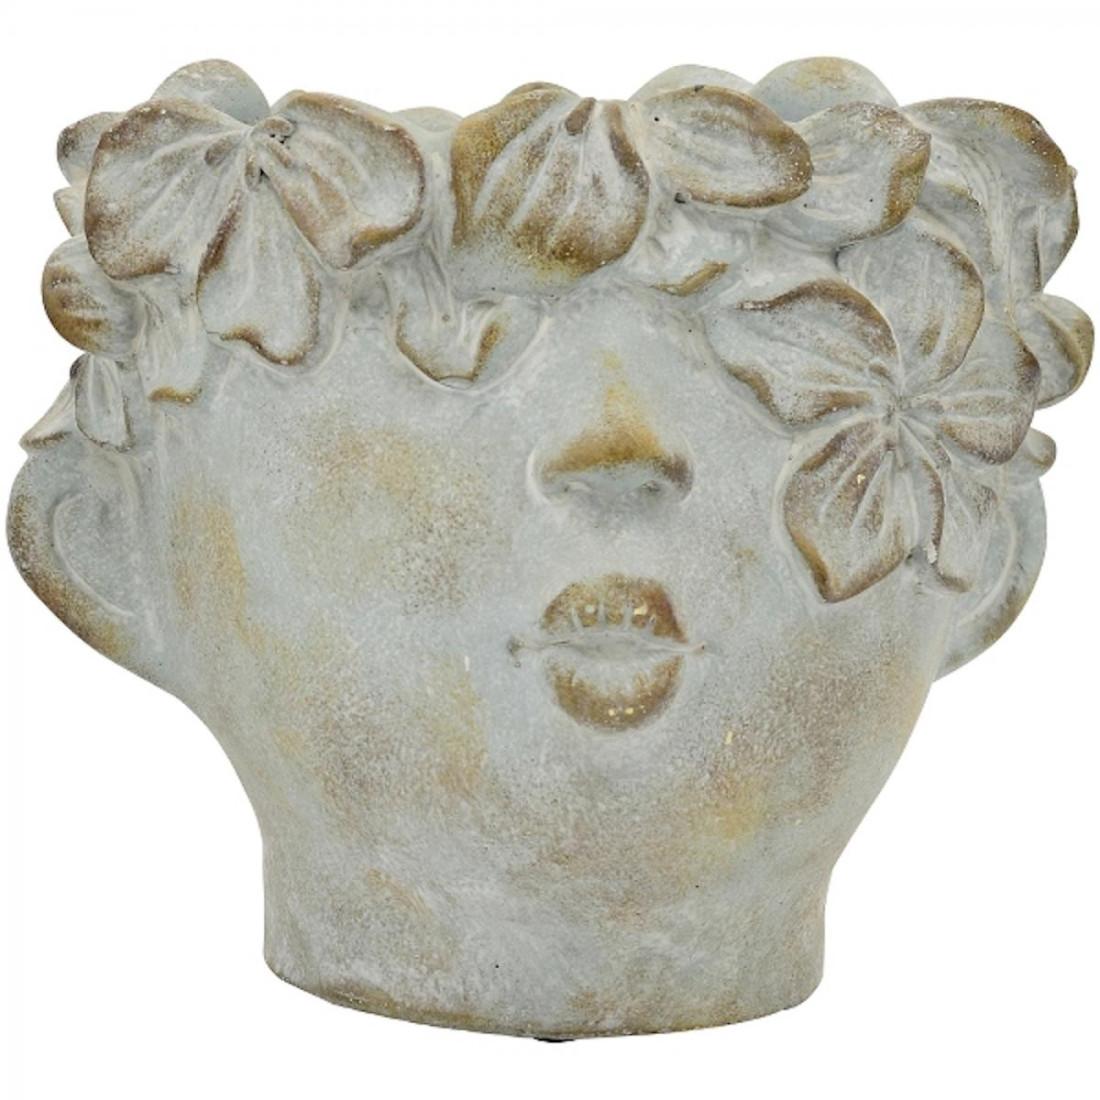 Büste Kinderkopf Pflanztopf Pflanzkopf Antiklook antik Keramik Blumentopf Kopf Figur Dekofigur Vintage Shabby grau creme (klein 240490)